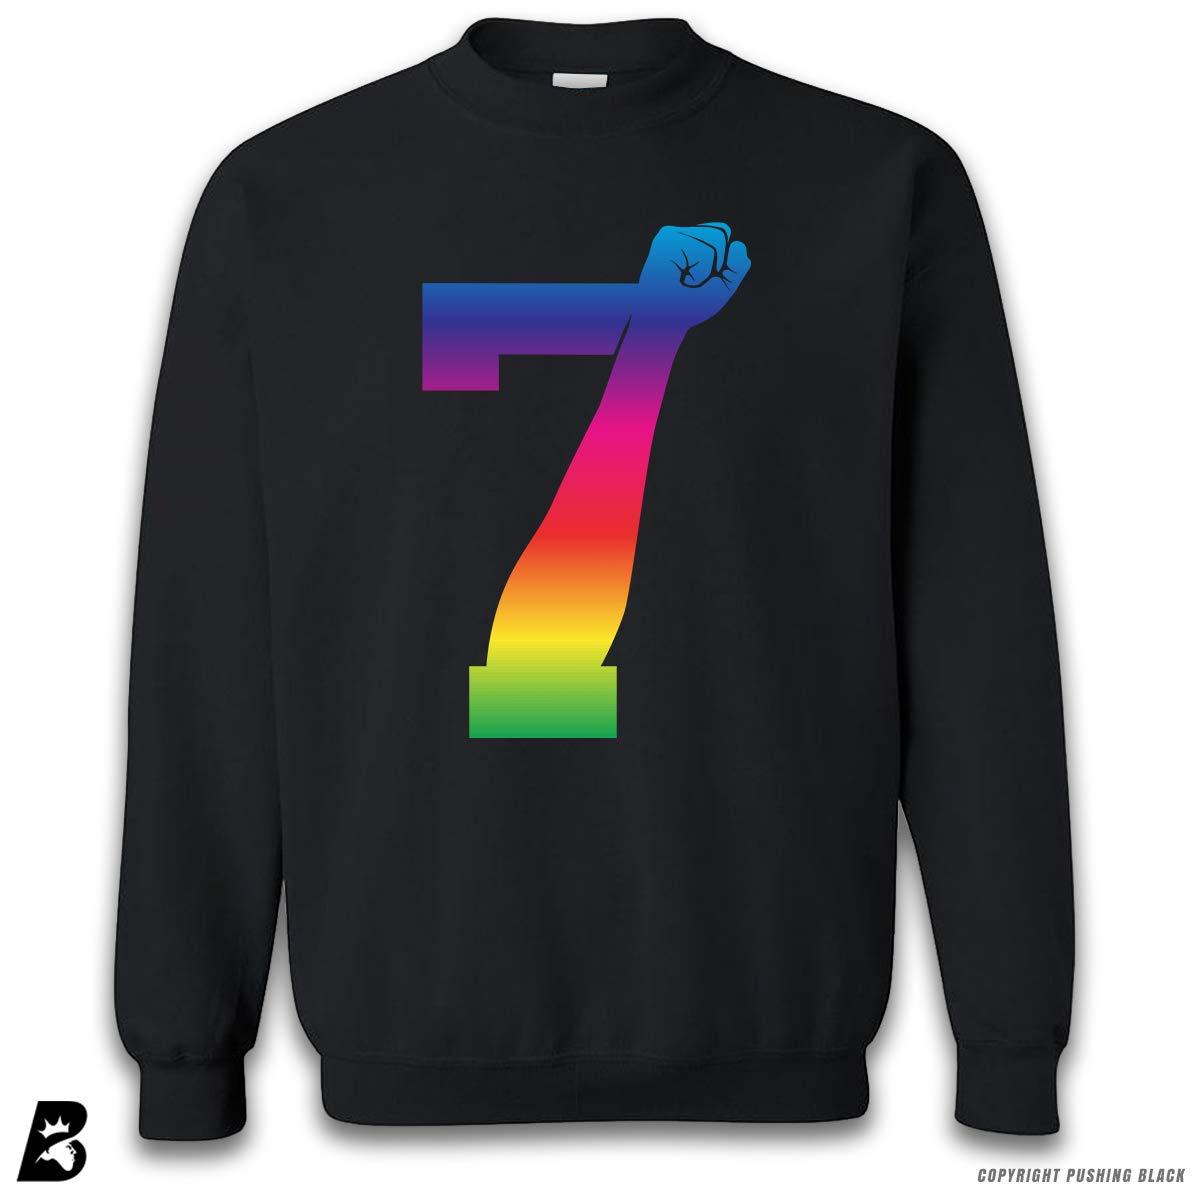 Rainbow Premium Unisex Sweatshirt 7 Fist Up High